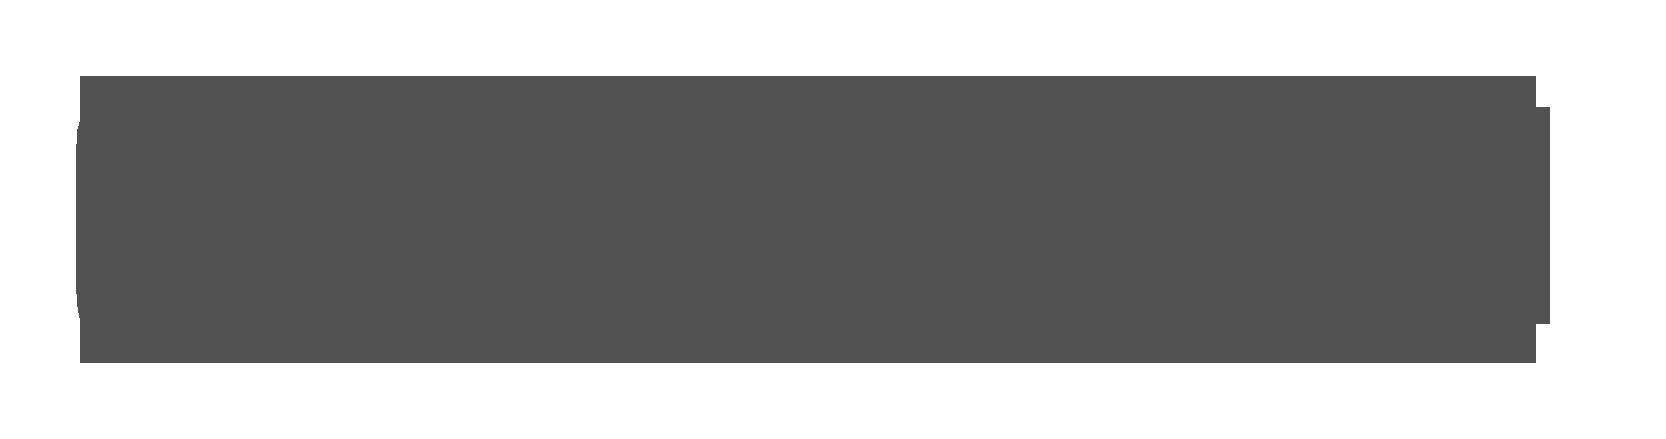 Plangridlogo.png